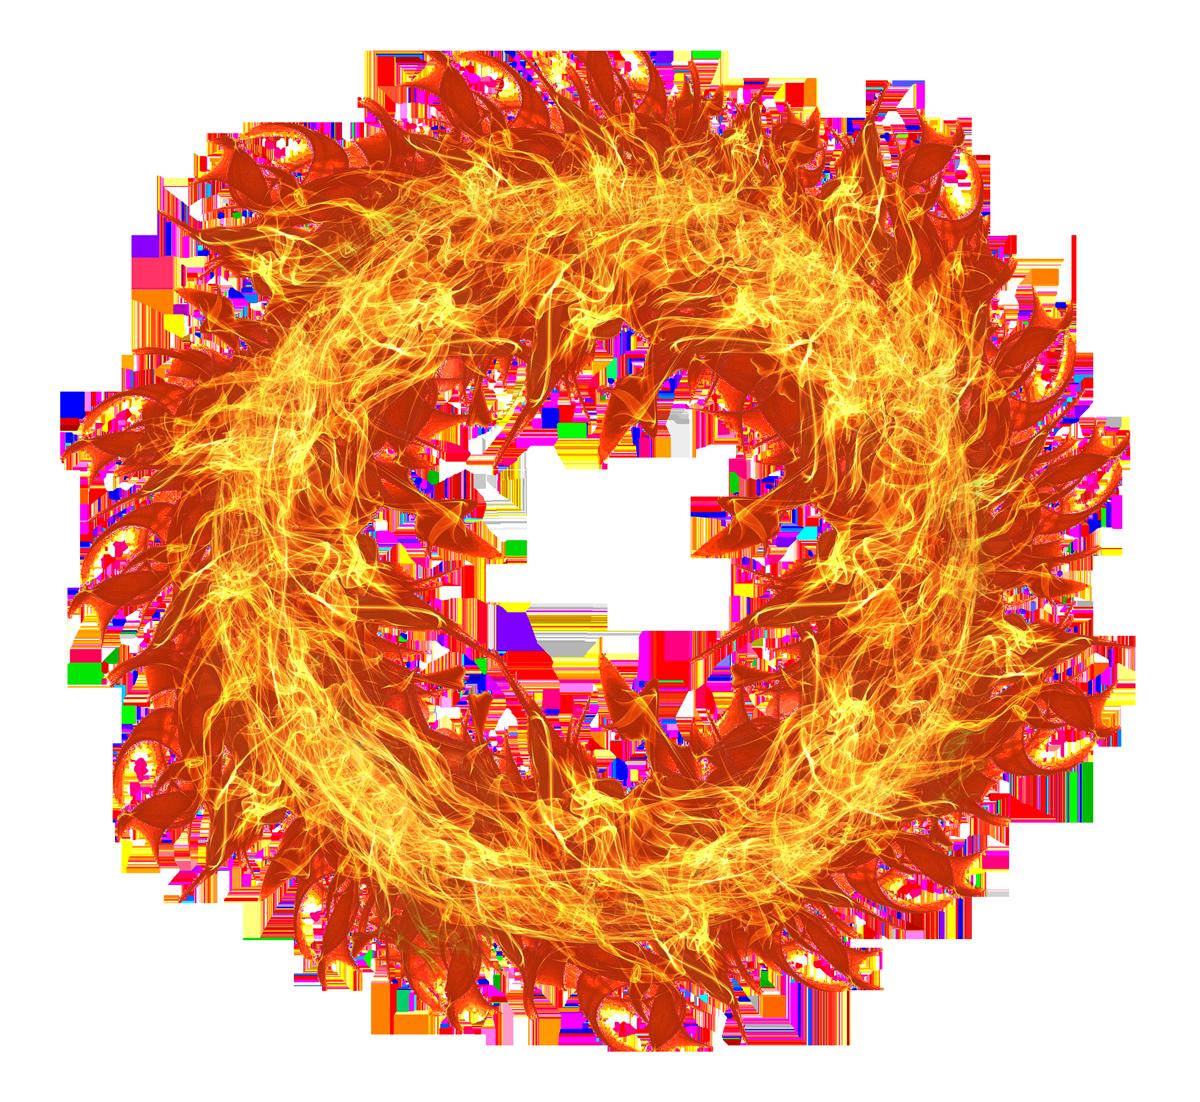 Fire Flame Circle Png Image Dnd Plantas